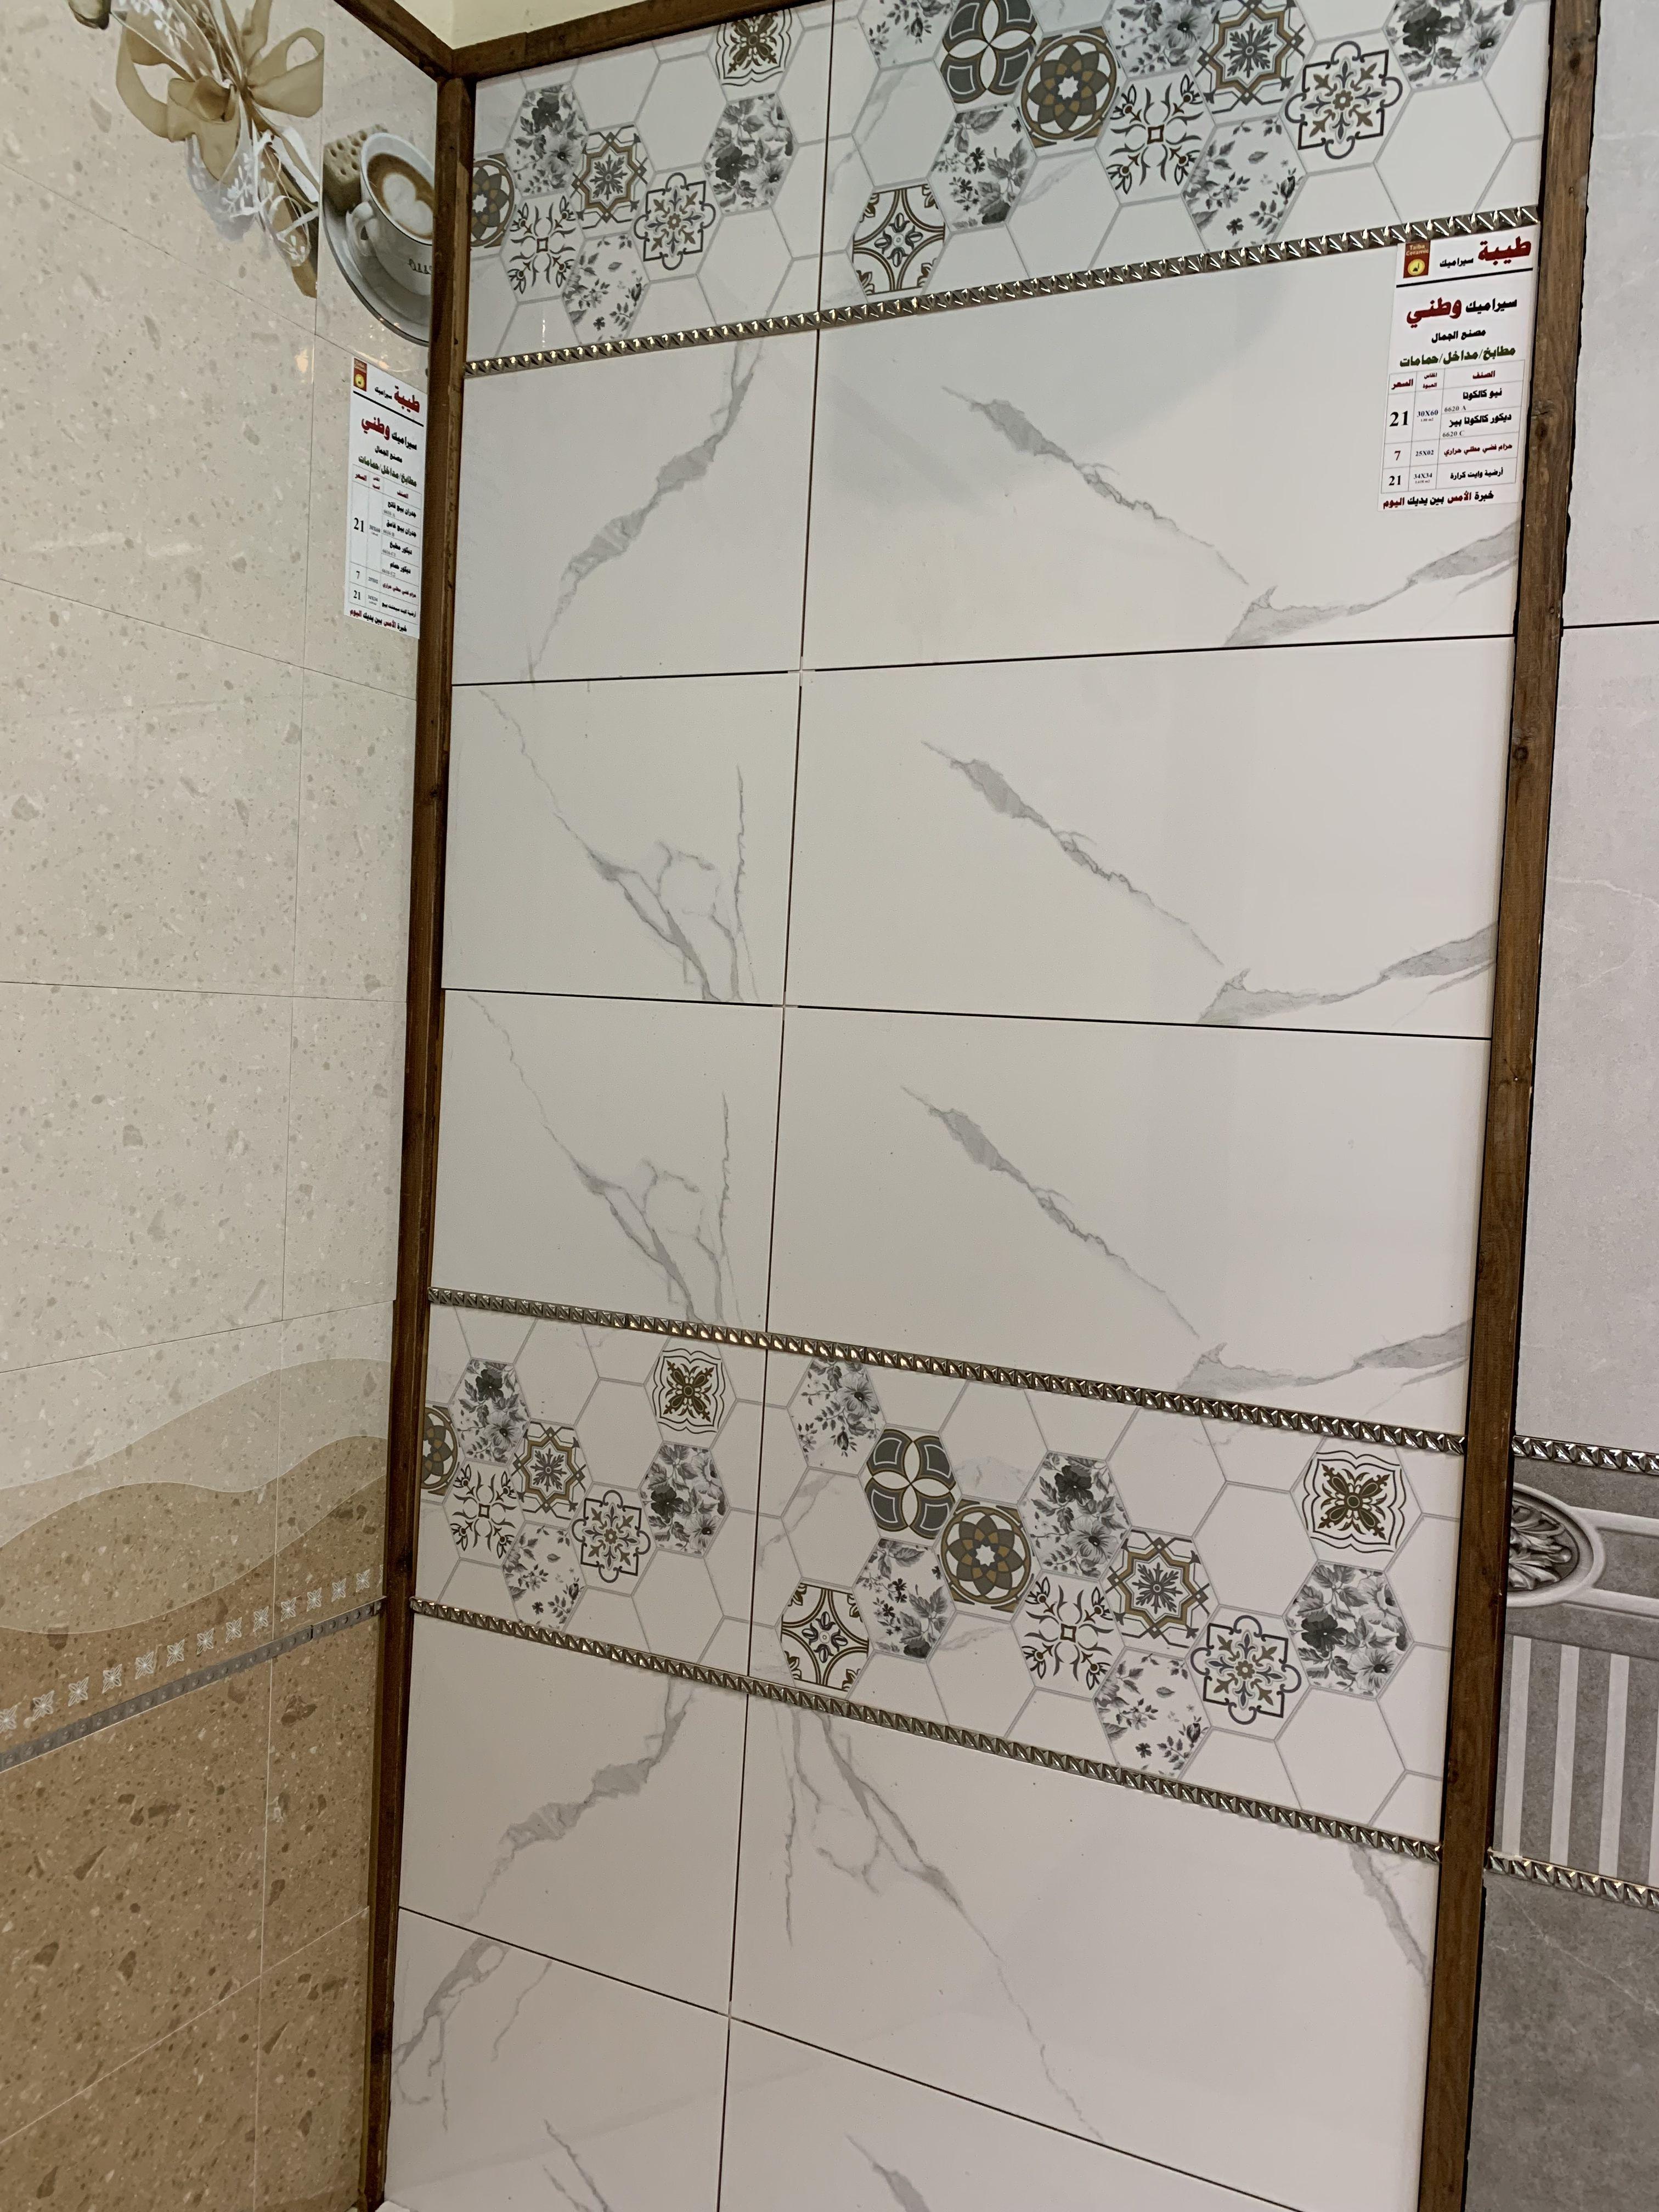 Pin By Bsooooo On منزل Decor Home Decor Room Divider